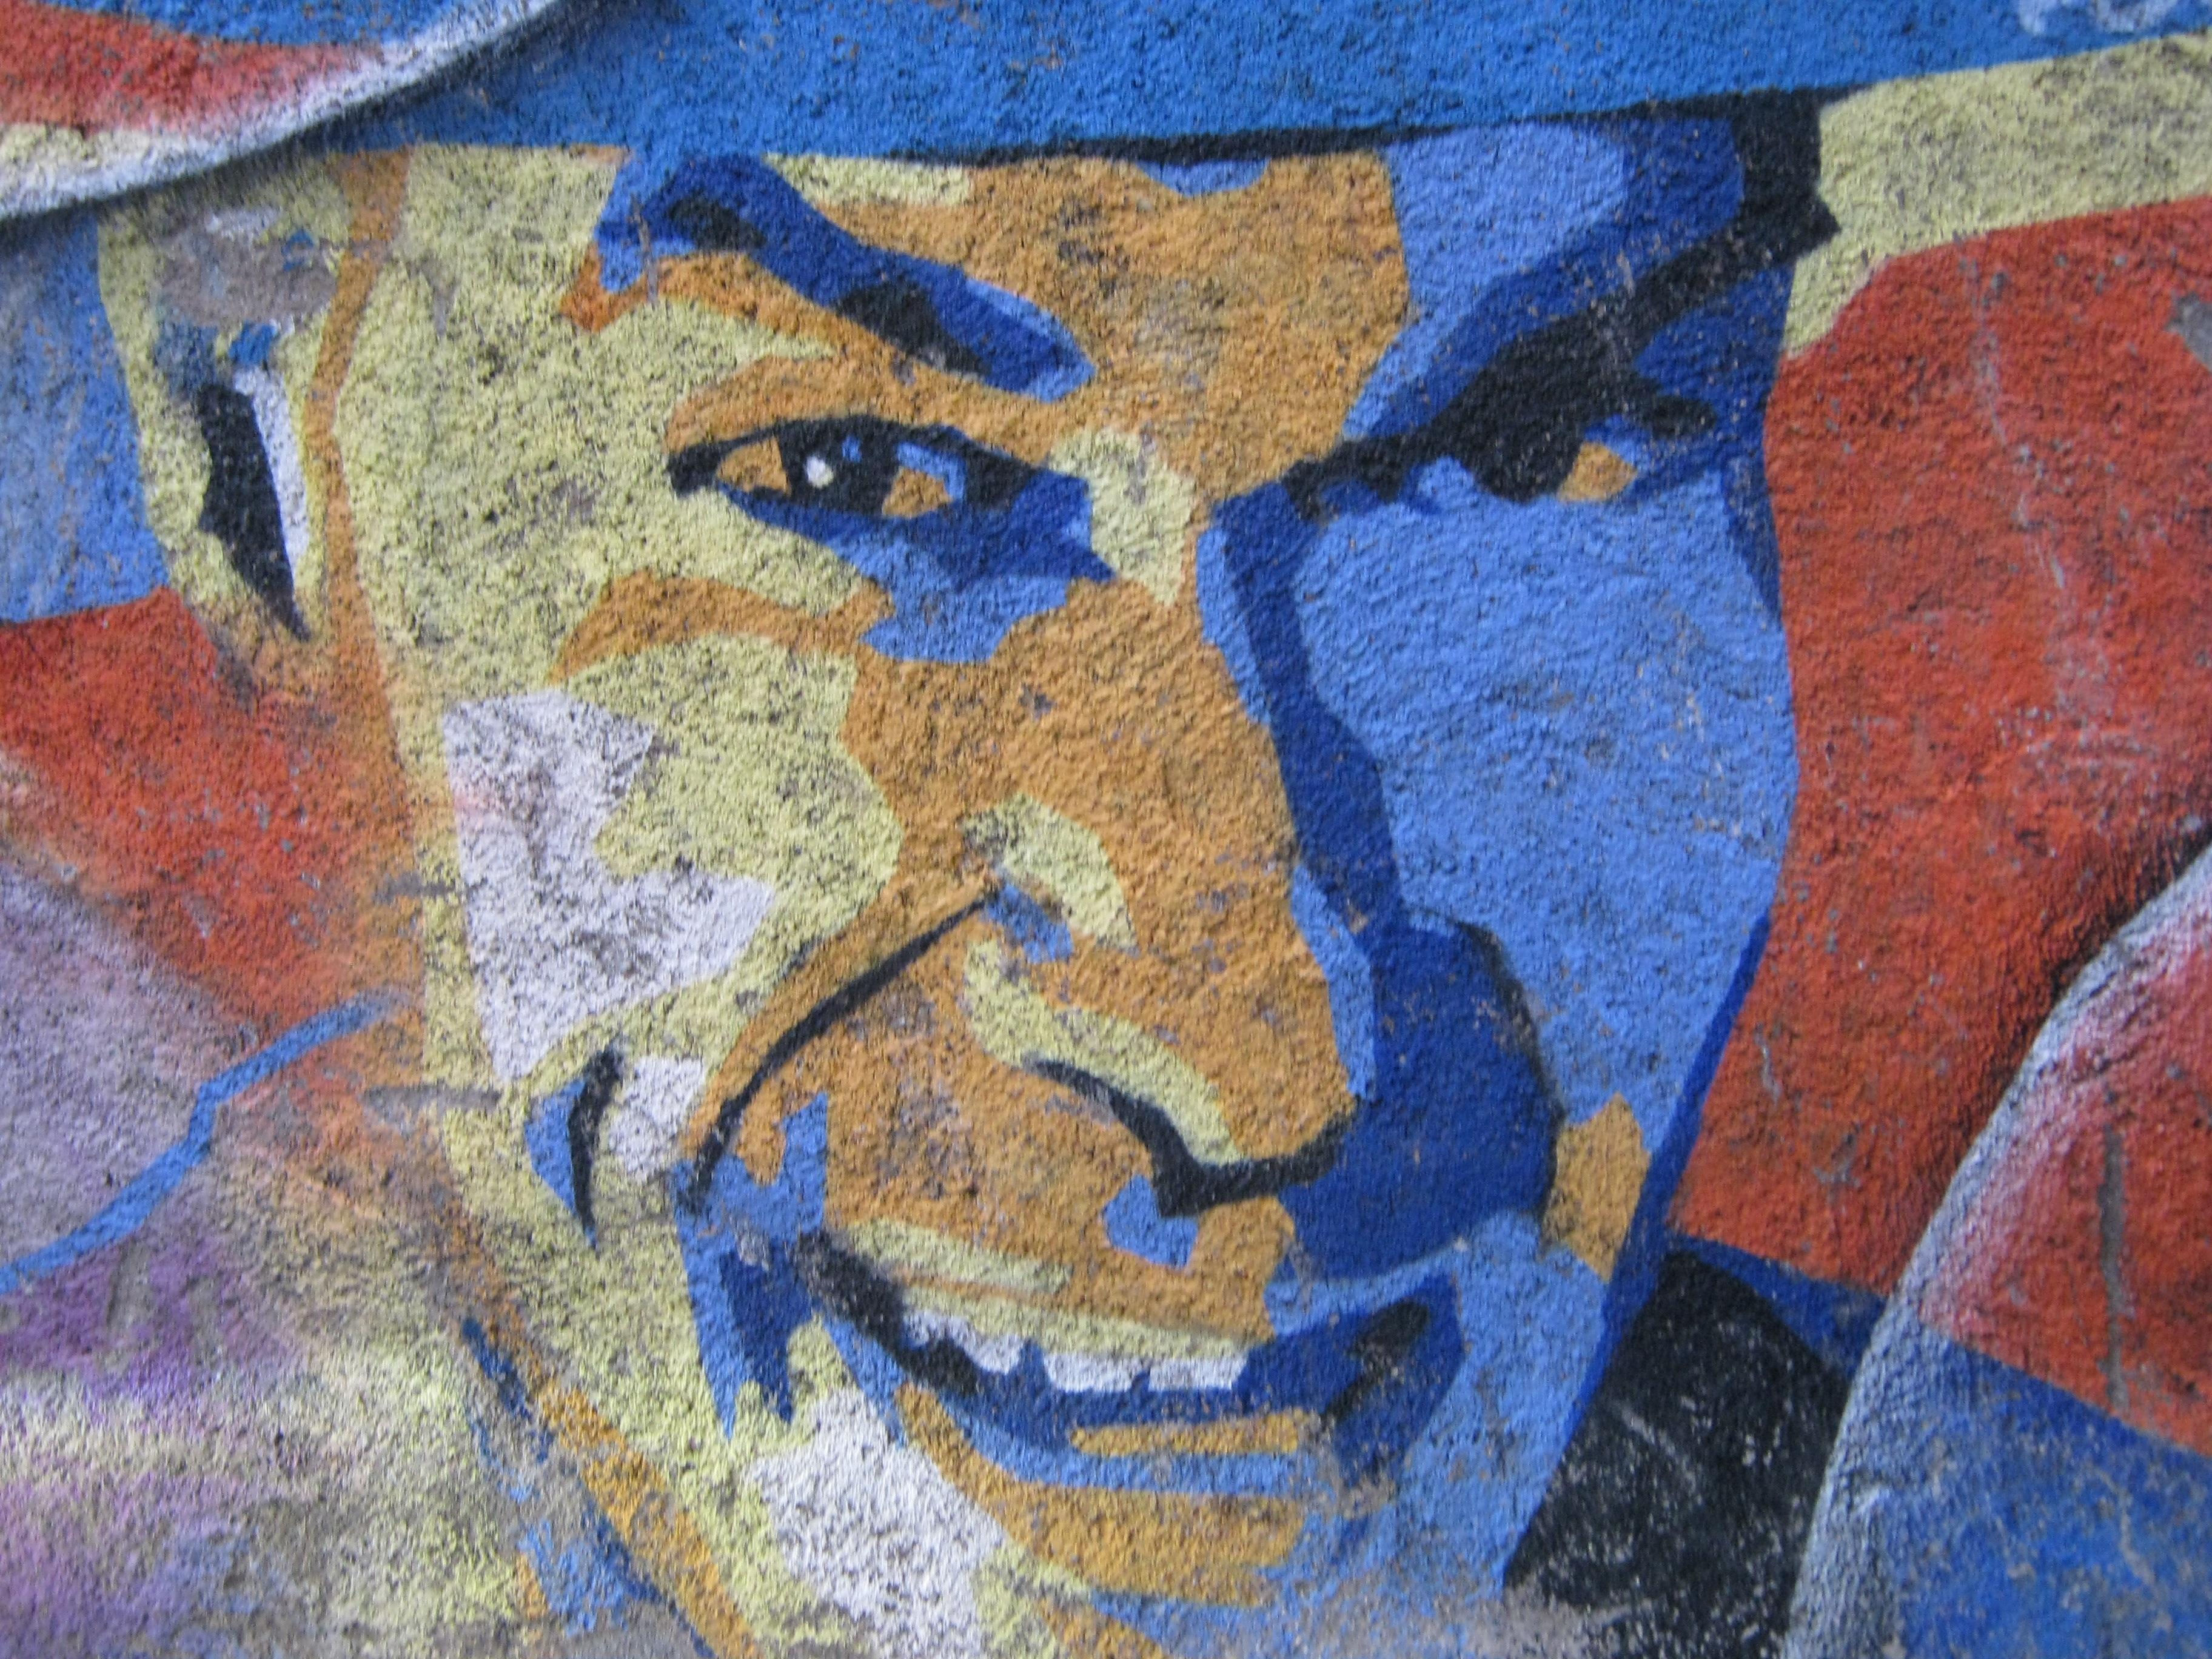 Fotos Gratis : Hombre, Persona, Ver, Pared, Chico, Retrato, Color, Azul, De  Cerca, Pintada, Sonreír, Juguetón, Ceja, Arte Callejero, Art, Uno, Mural,  ...